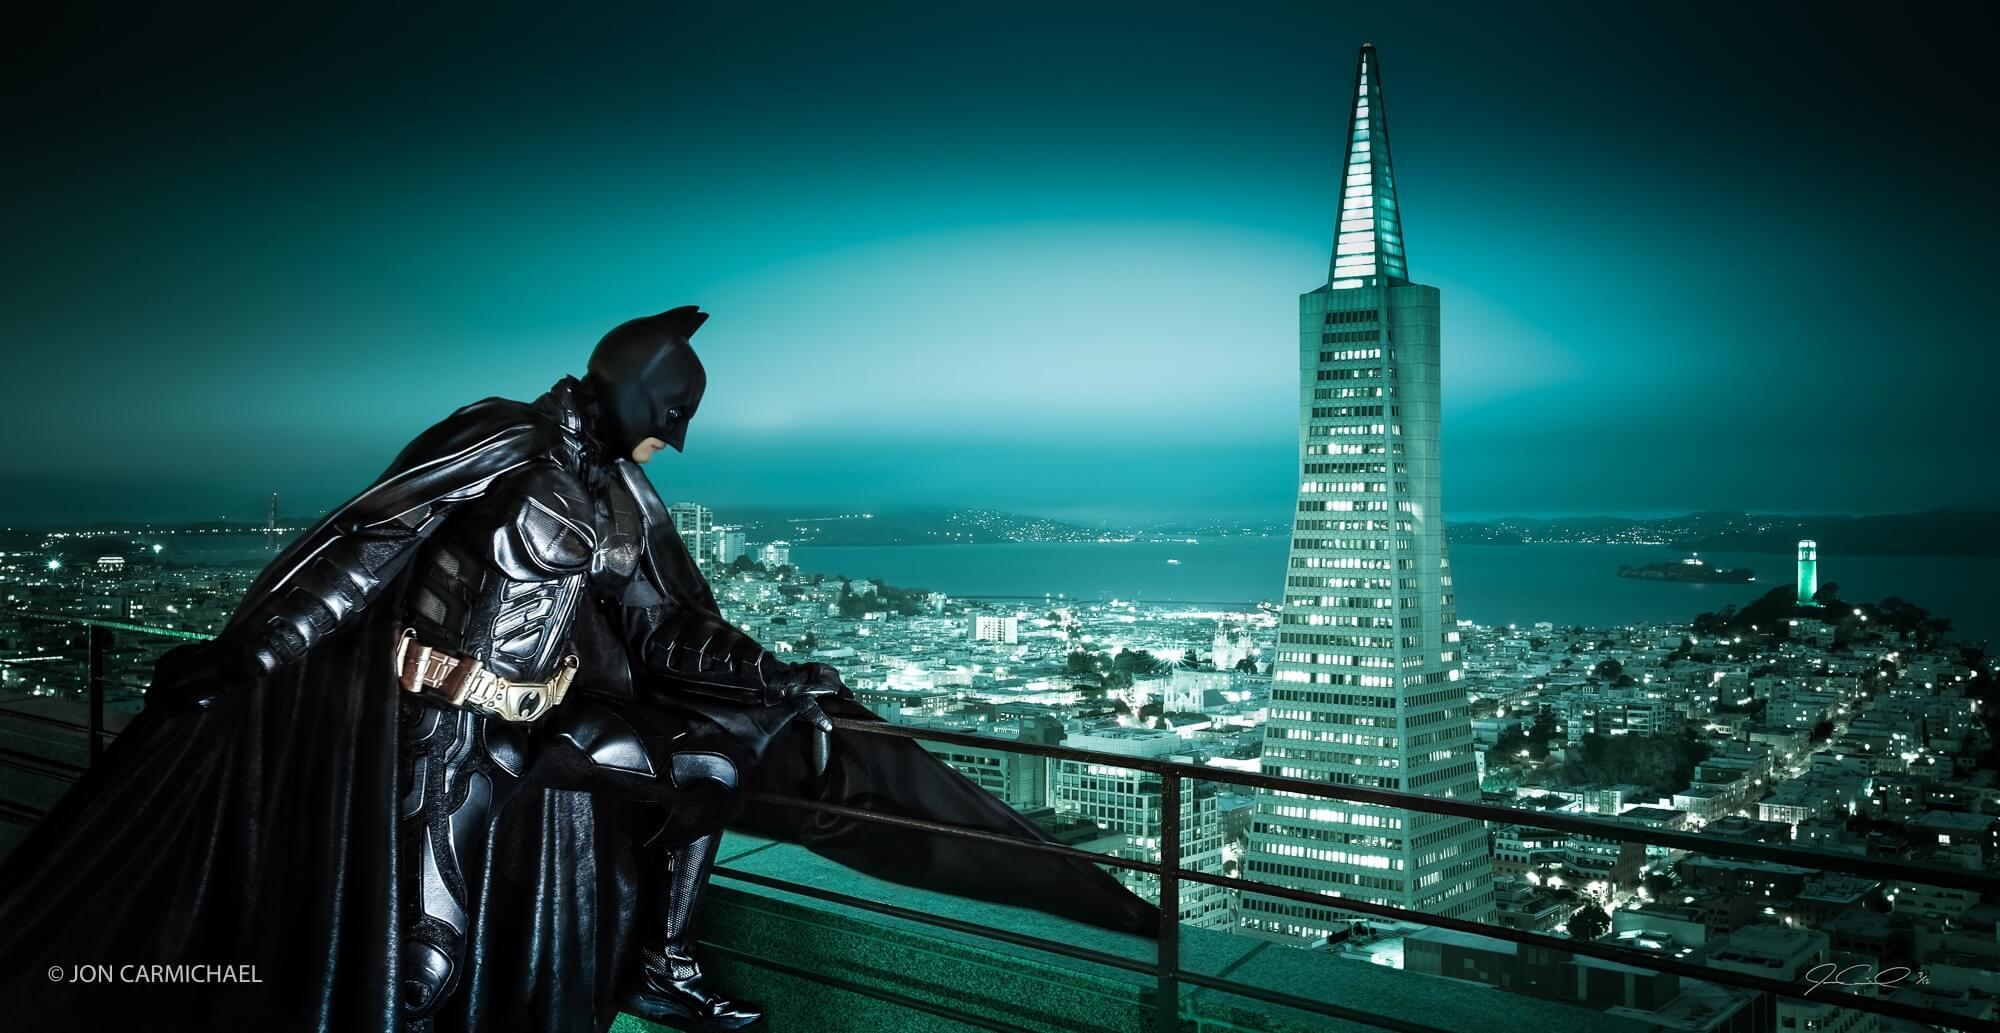 02_JonCarmichael_2014_Anonymous_batman-dark-knight-costume.jpg